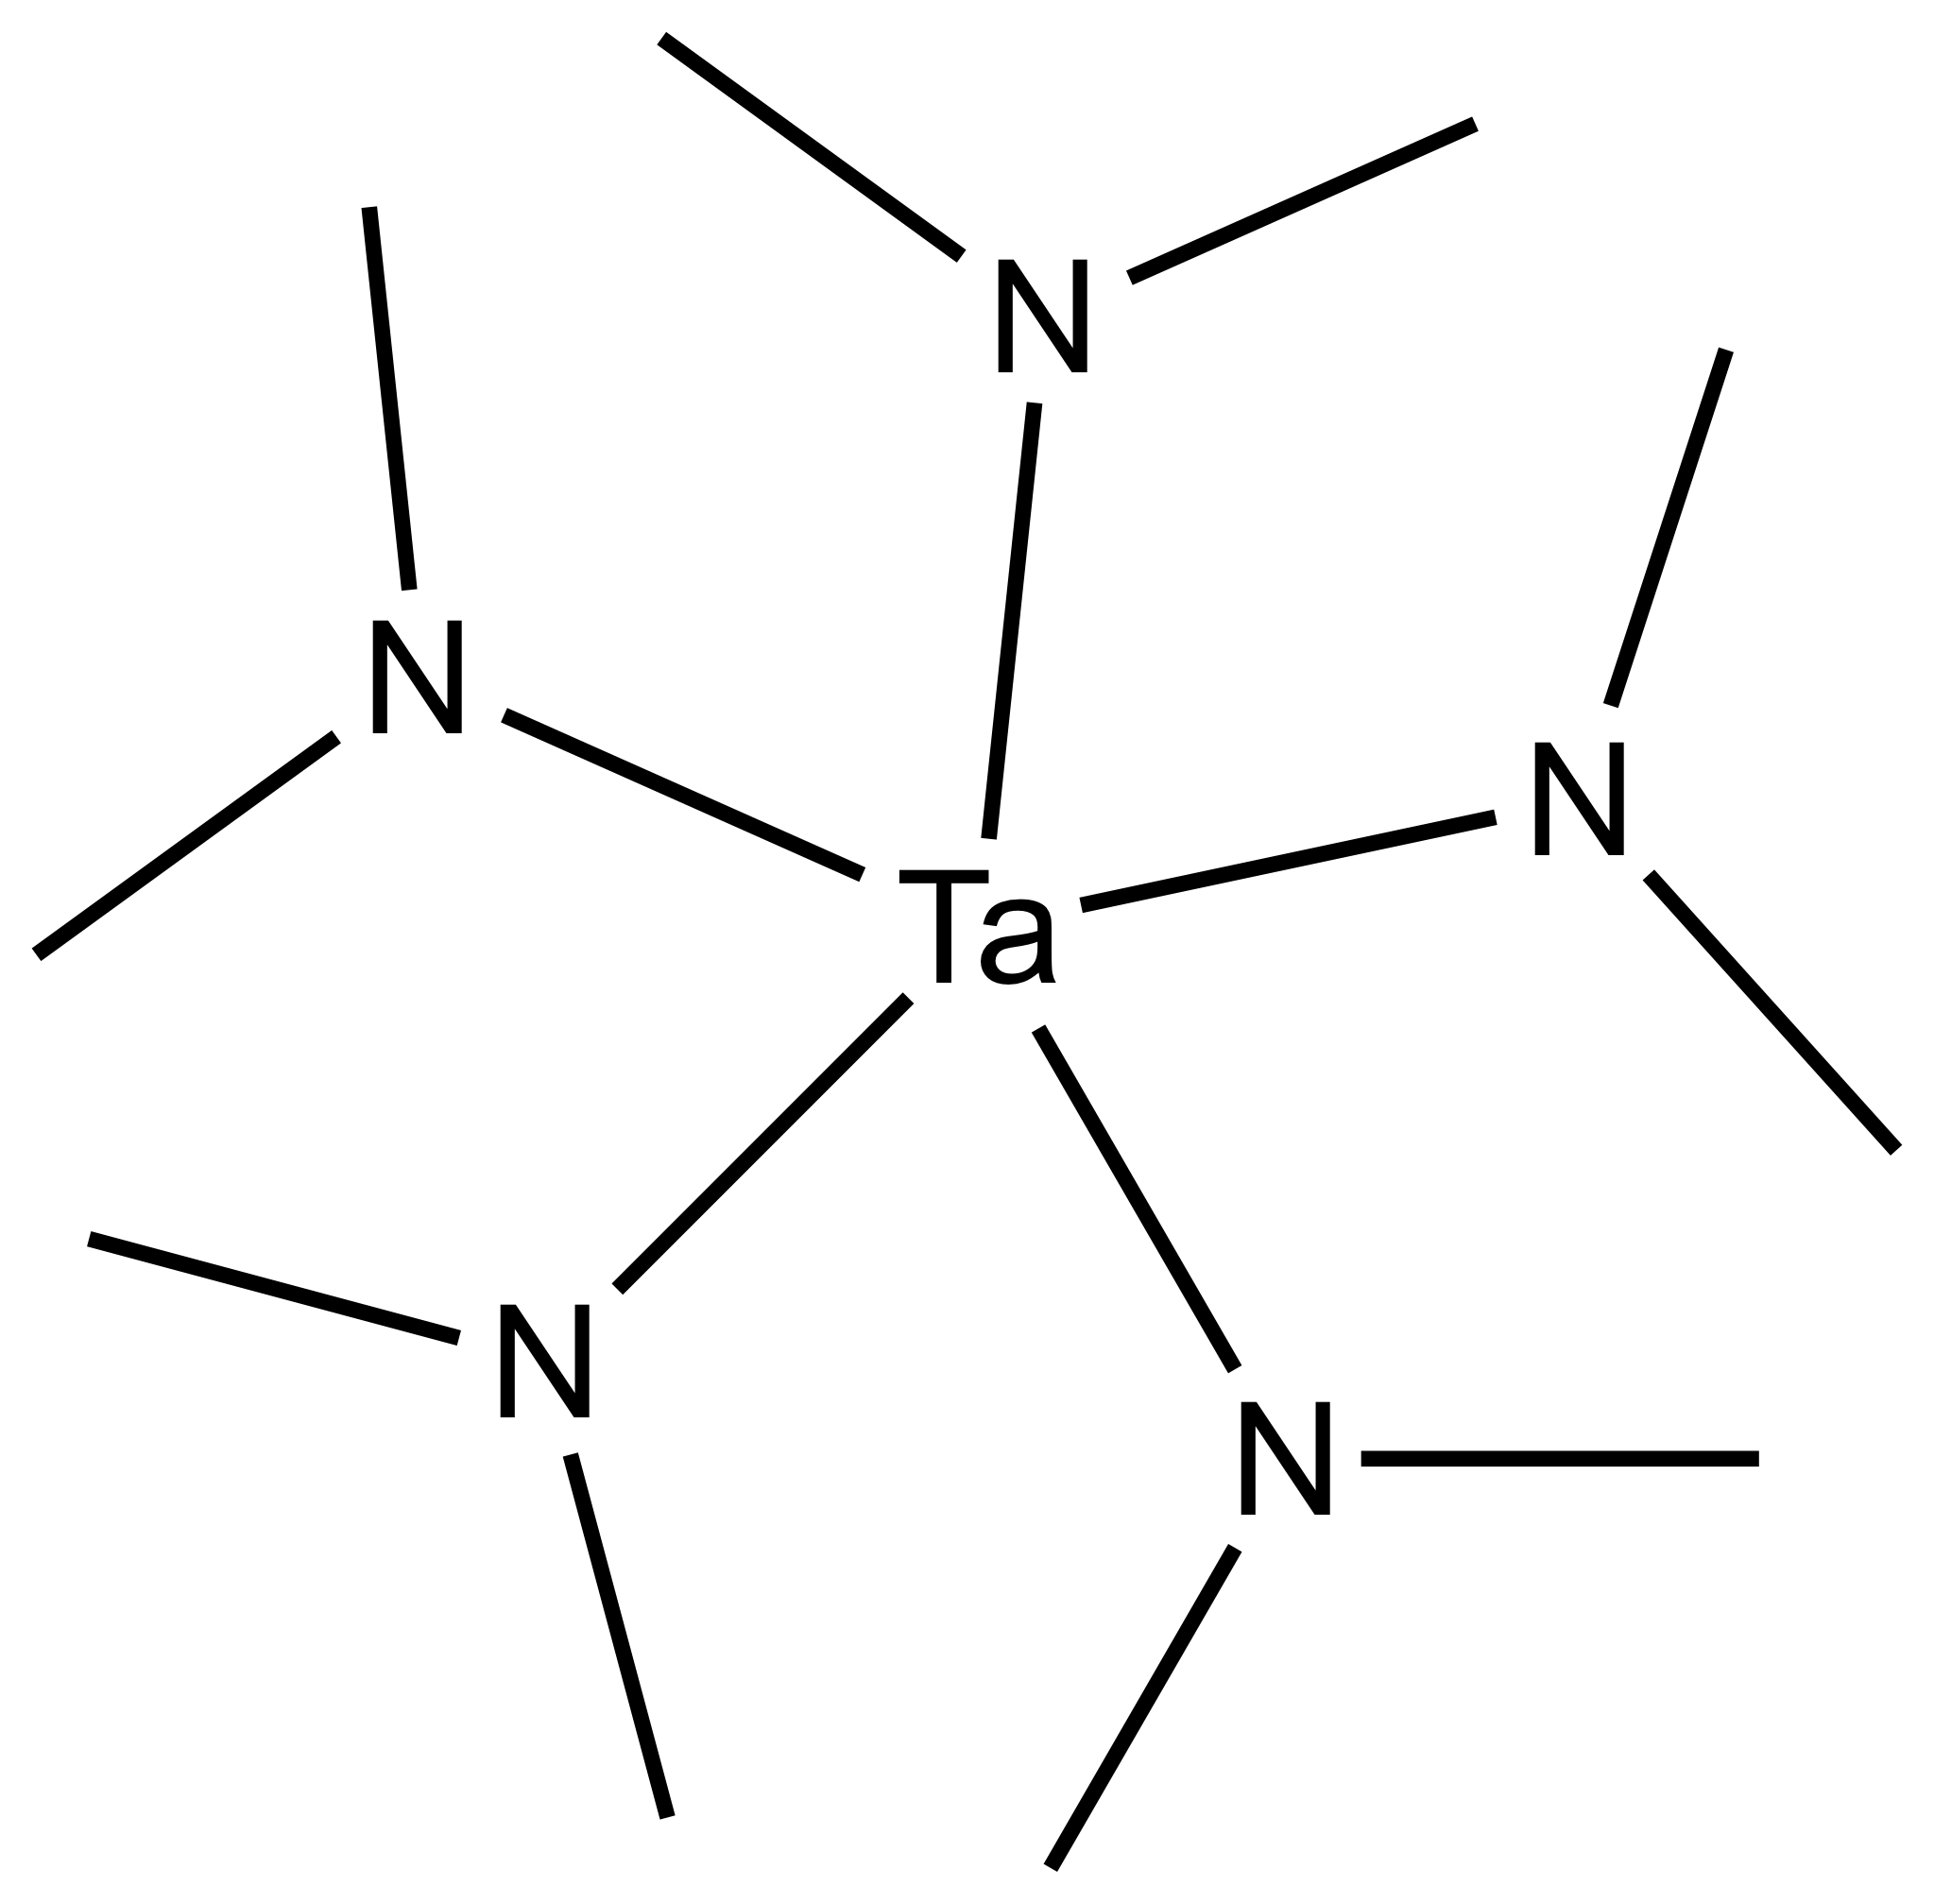 19824-59-0